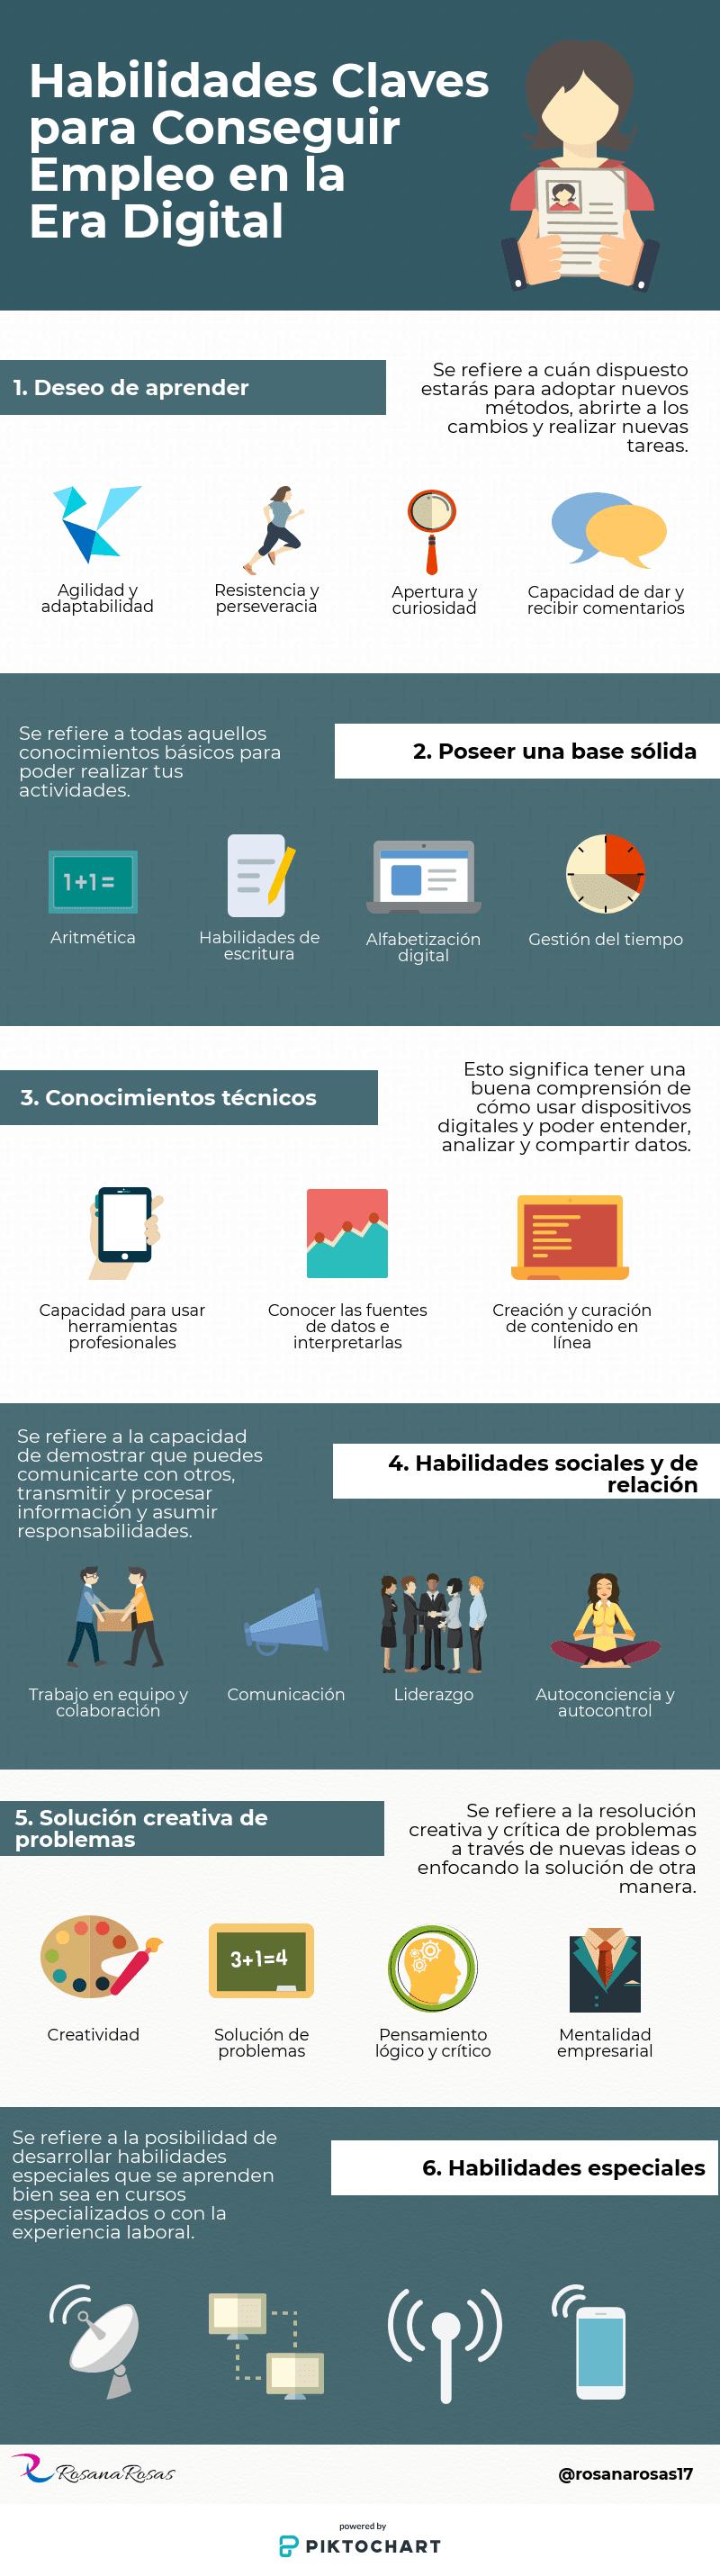 infografia-carrera-era-digital